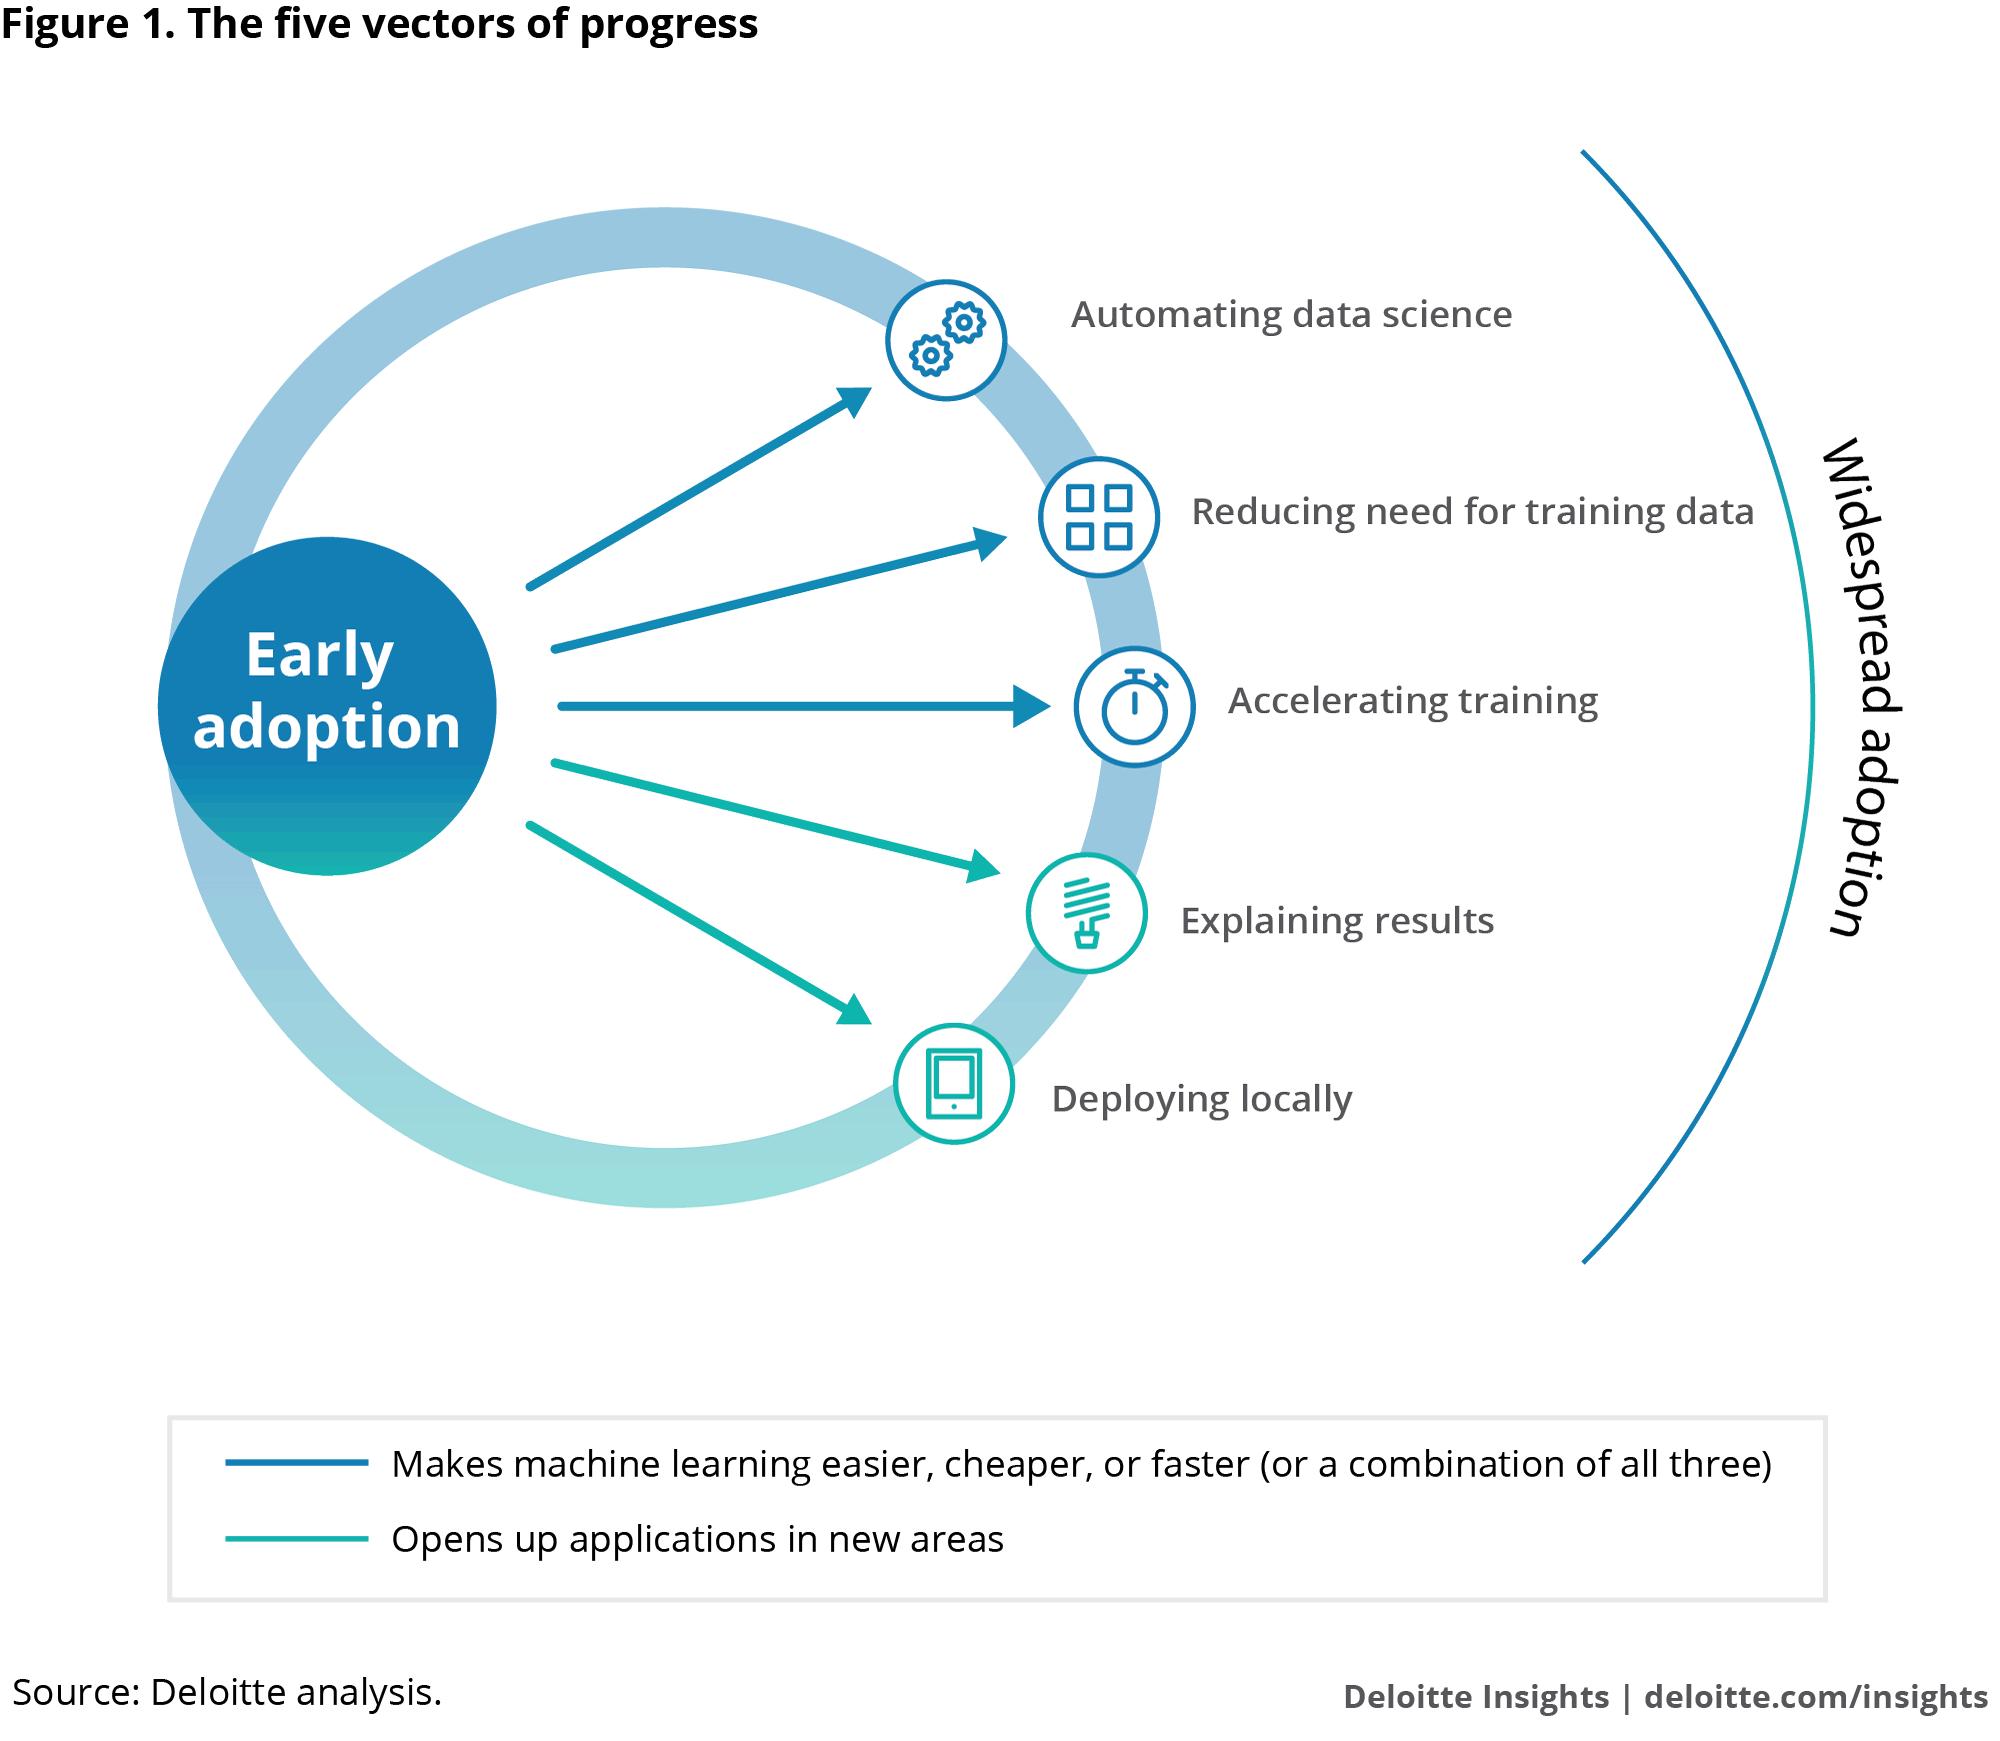 deloitte.com - Machine learning and the five vectors of progress